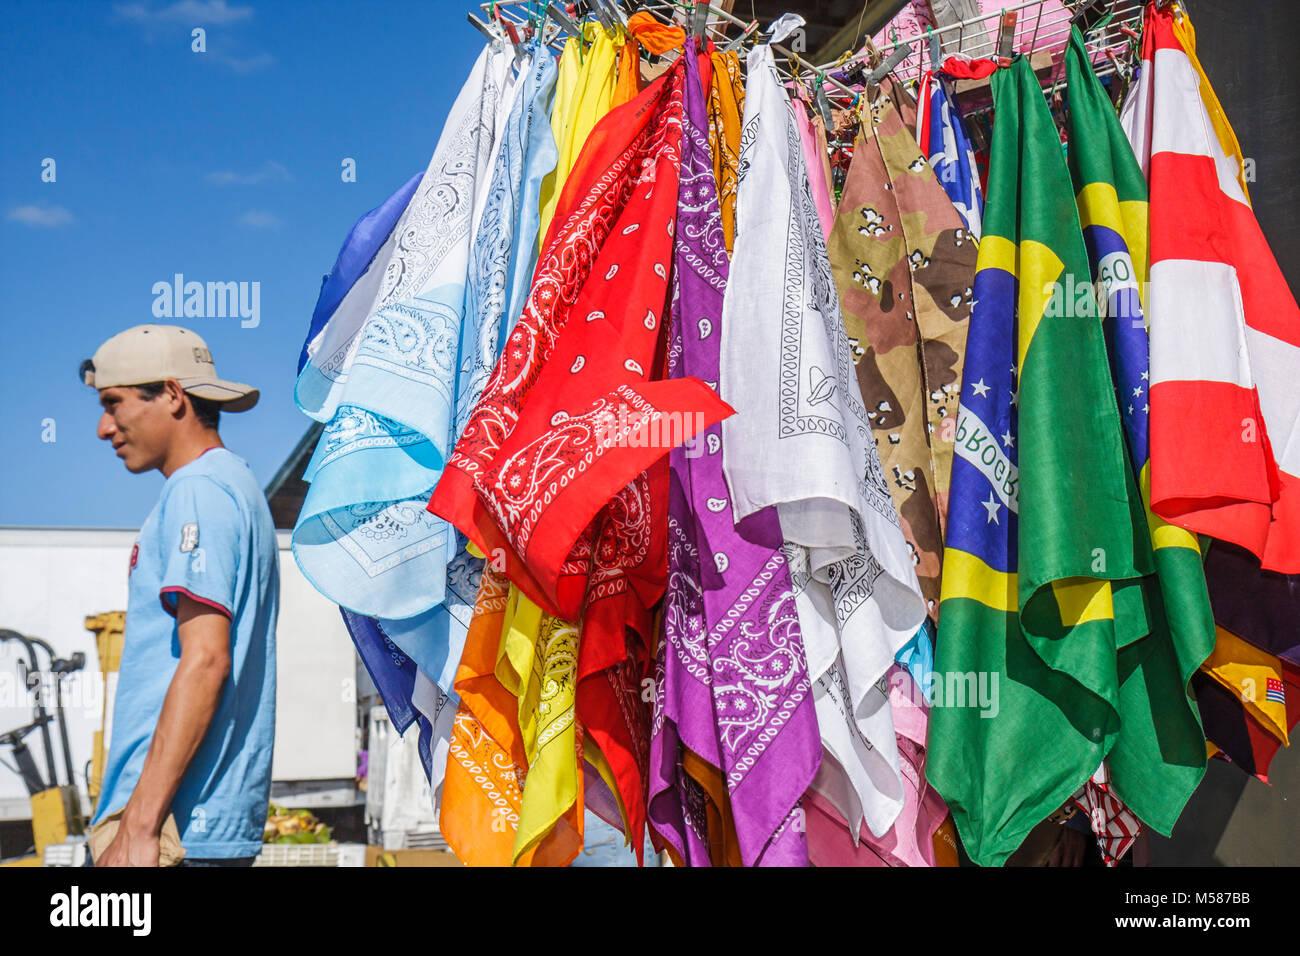 Homestead Route 1 One Farmers Market Hispanic man bandanas colorful - Stock Image